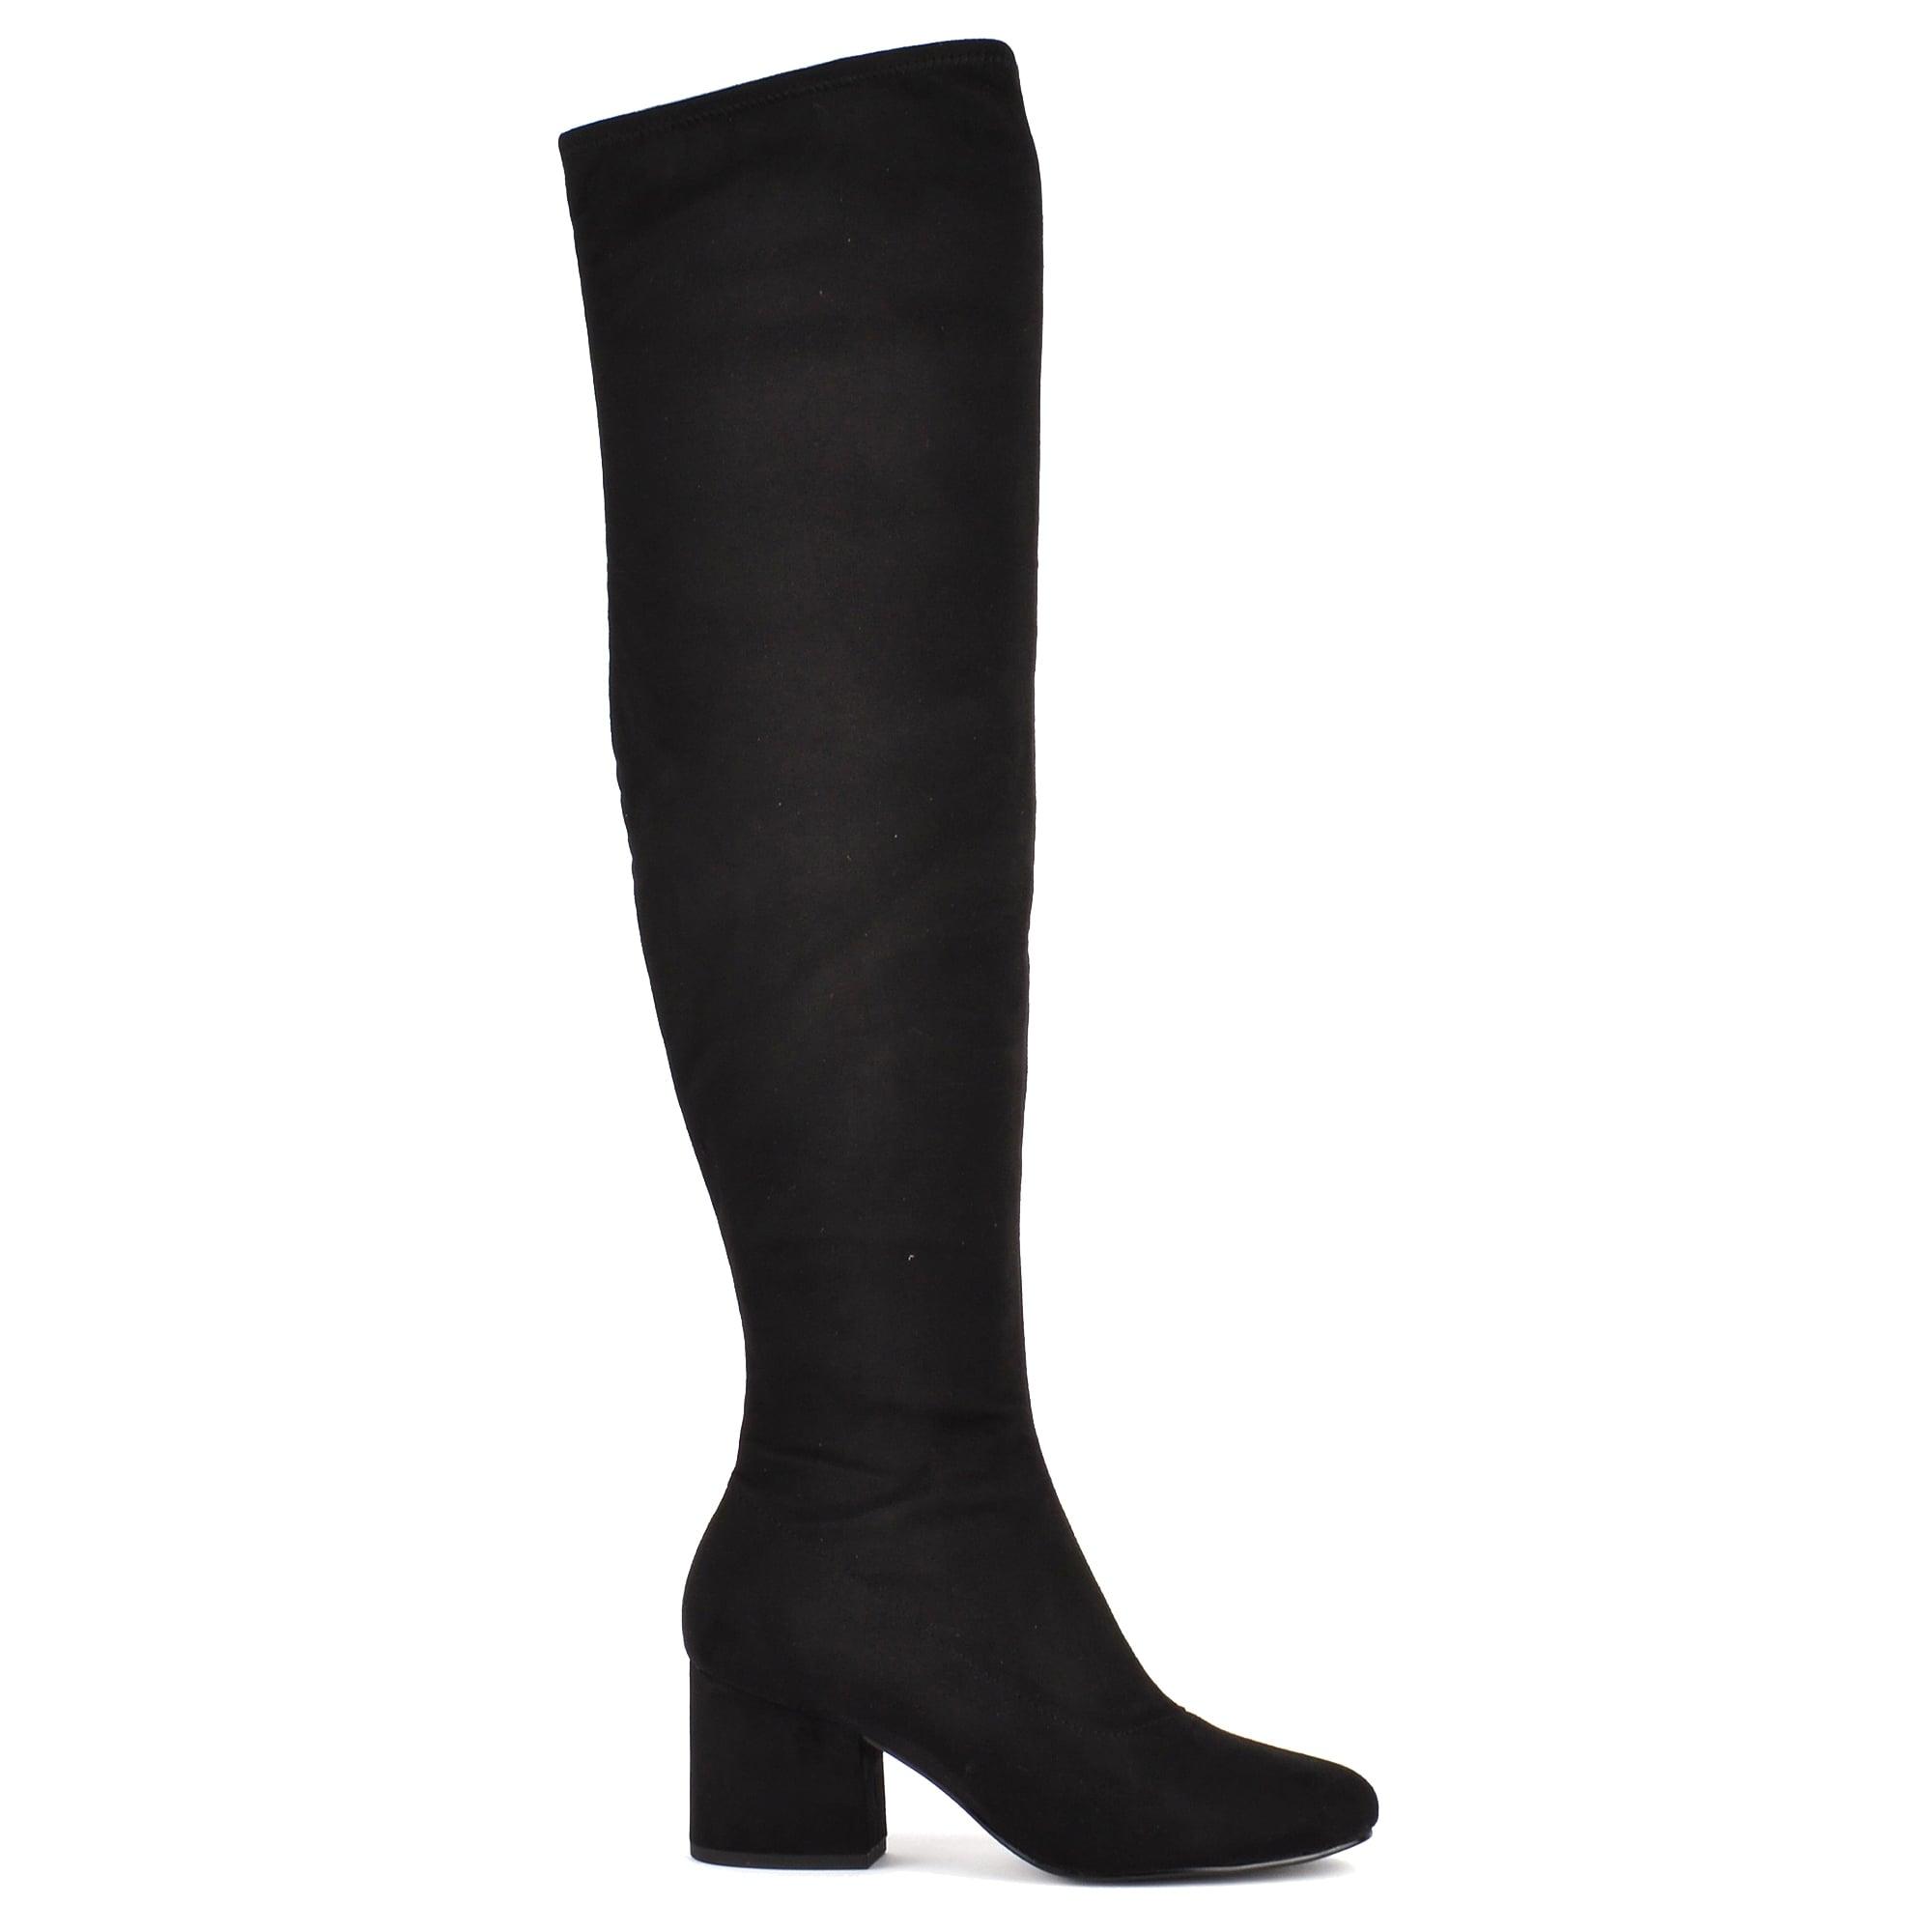 Kylie Kayla Black Suede Knee Boots